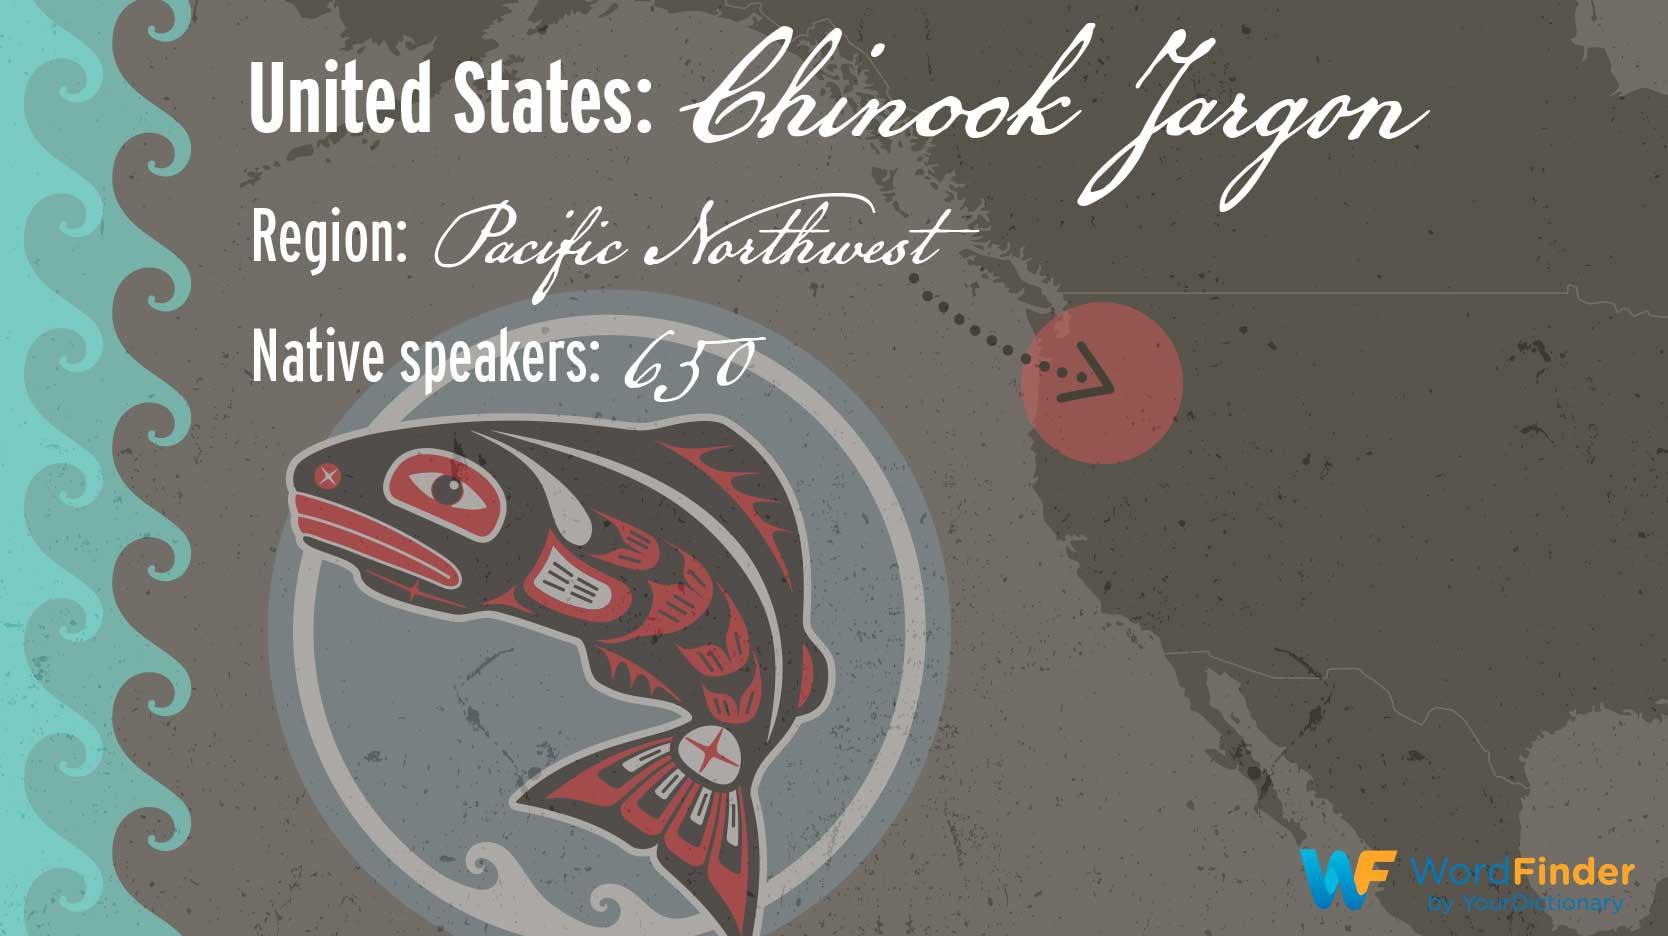 Chinook Jargon language in United States